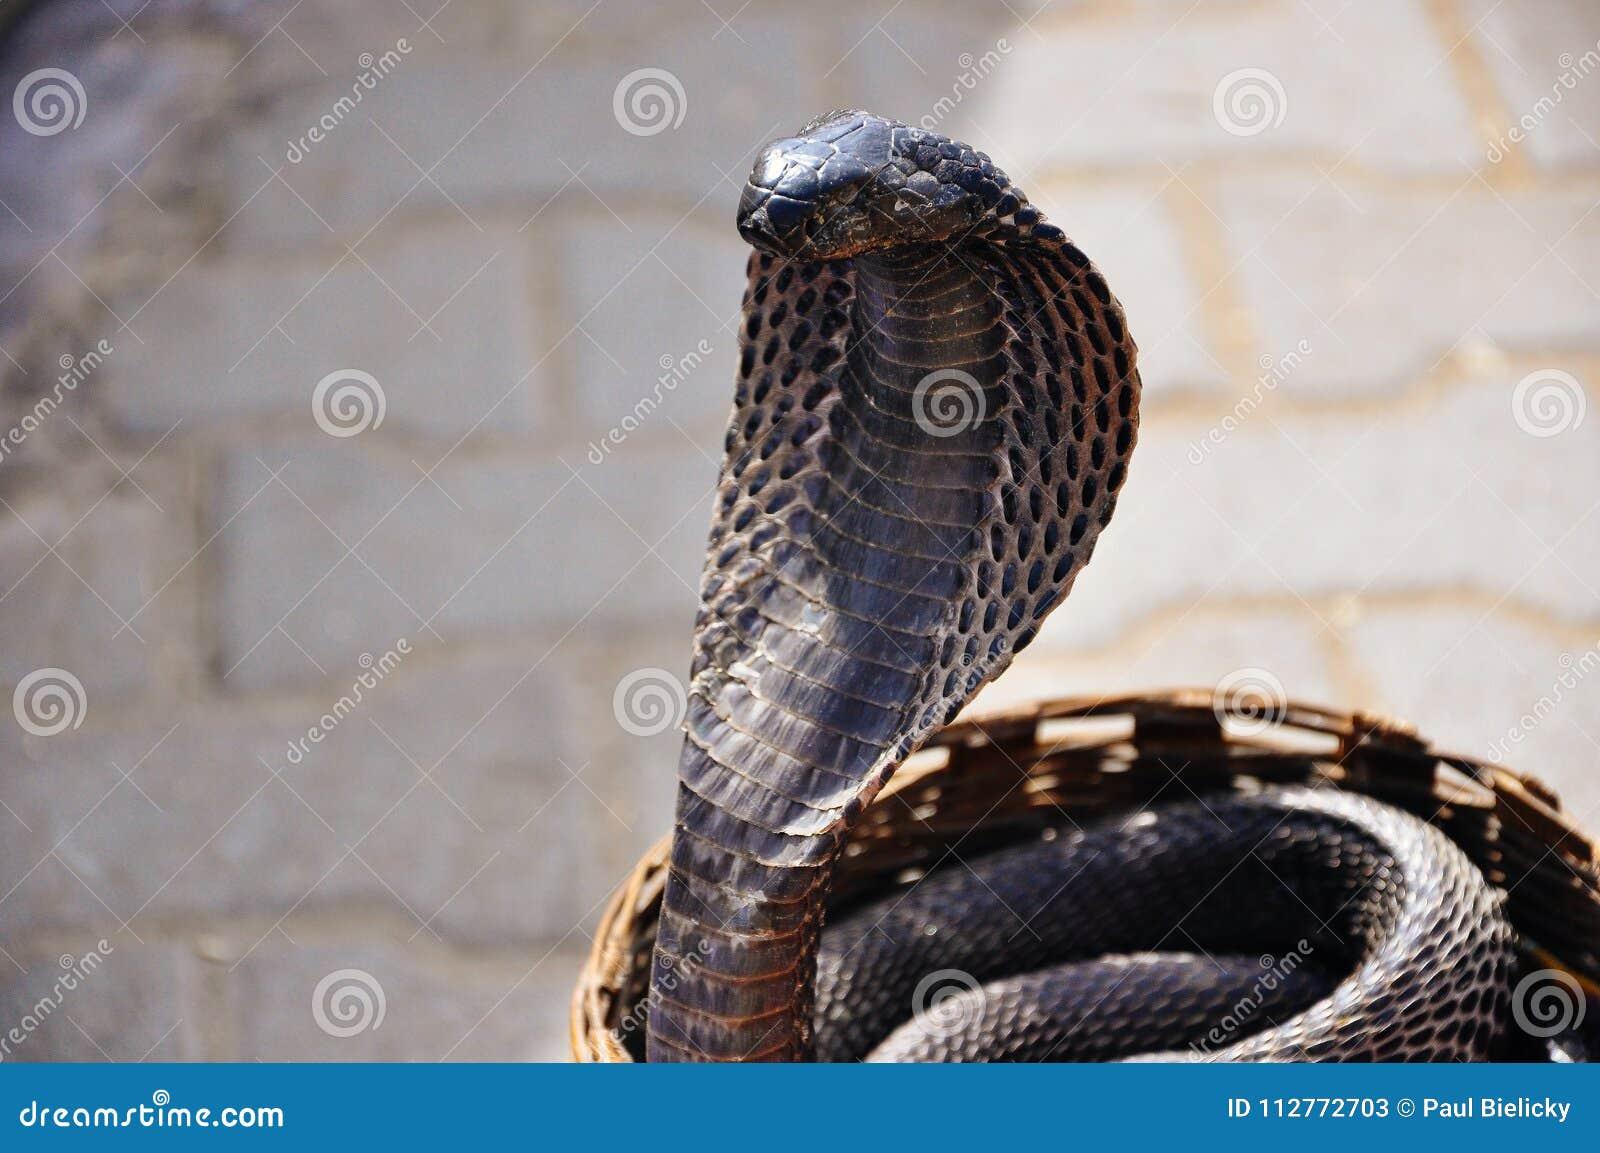 A black cobra in Jaipur, India.